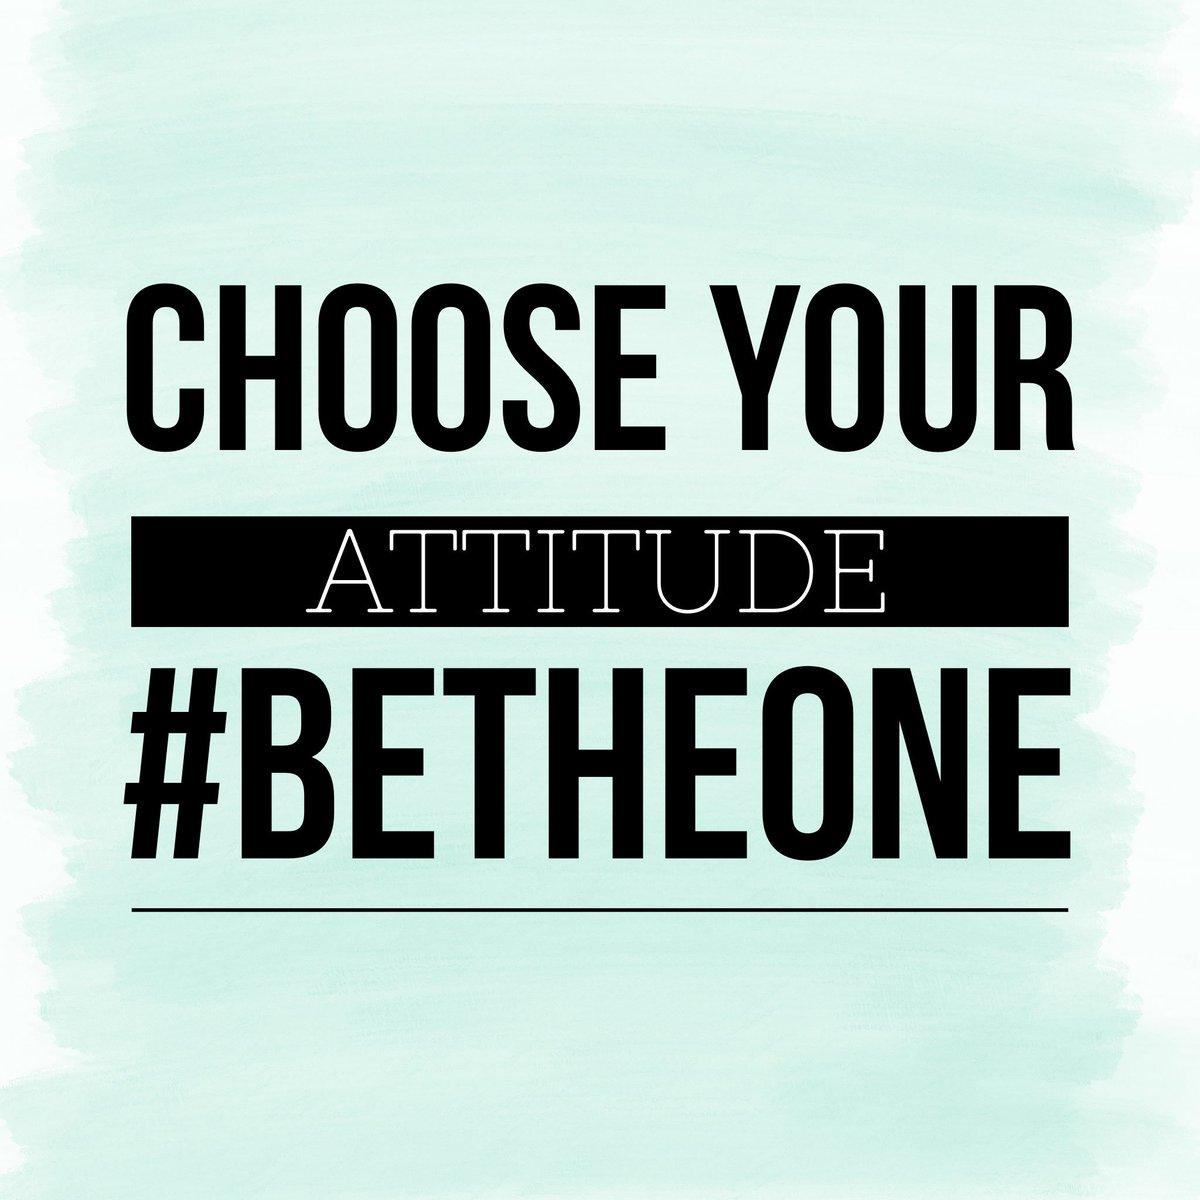 Happy Monday! Make this week amazing. #BeTheOne #tlap #KidsDeserveIt #CelebrateMonday #positivity #joyfulleaders